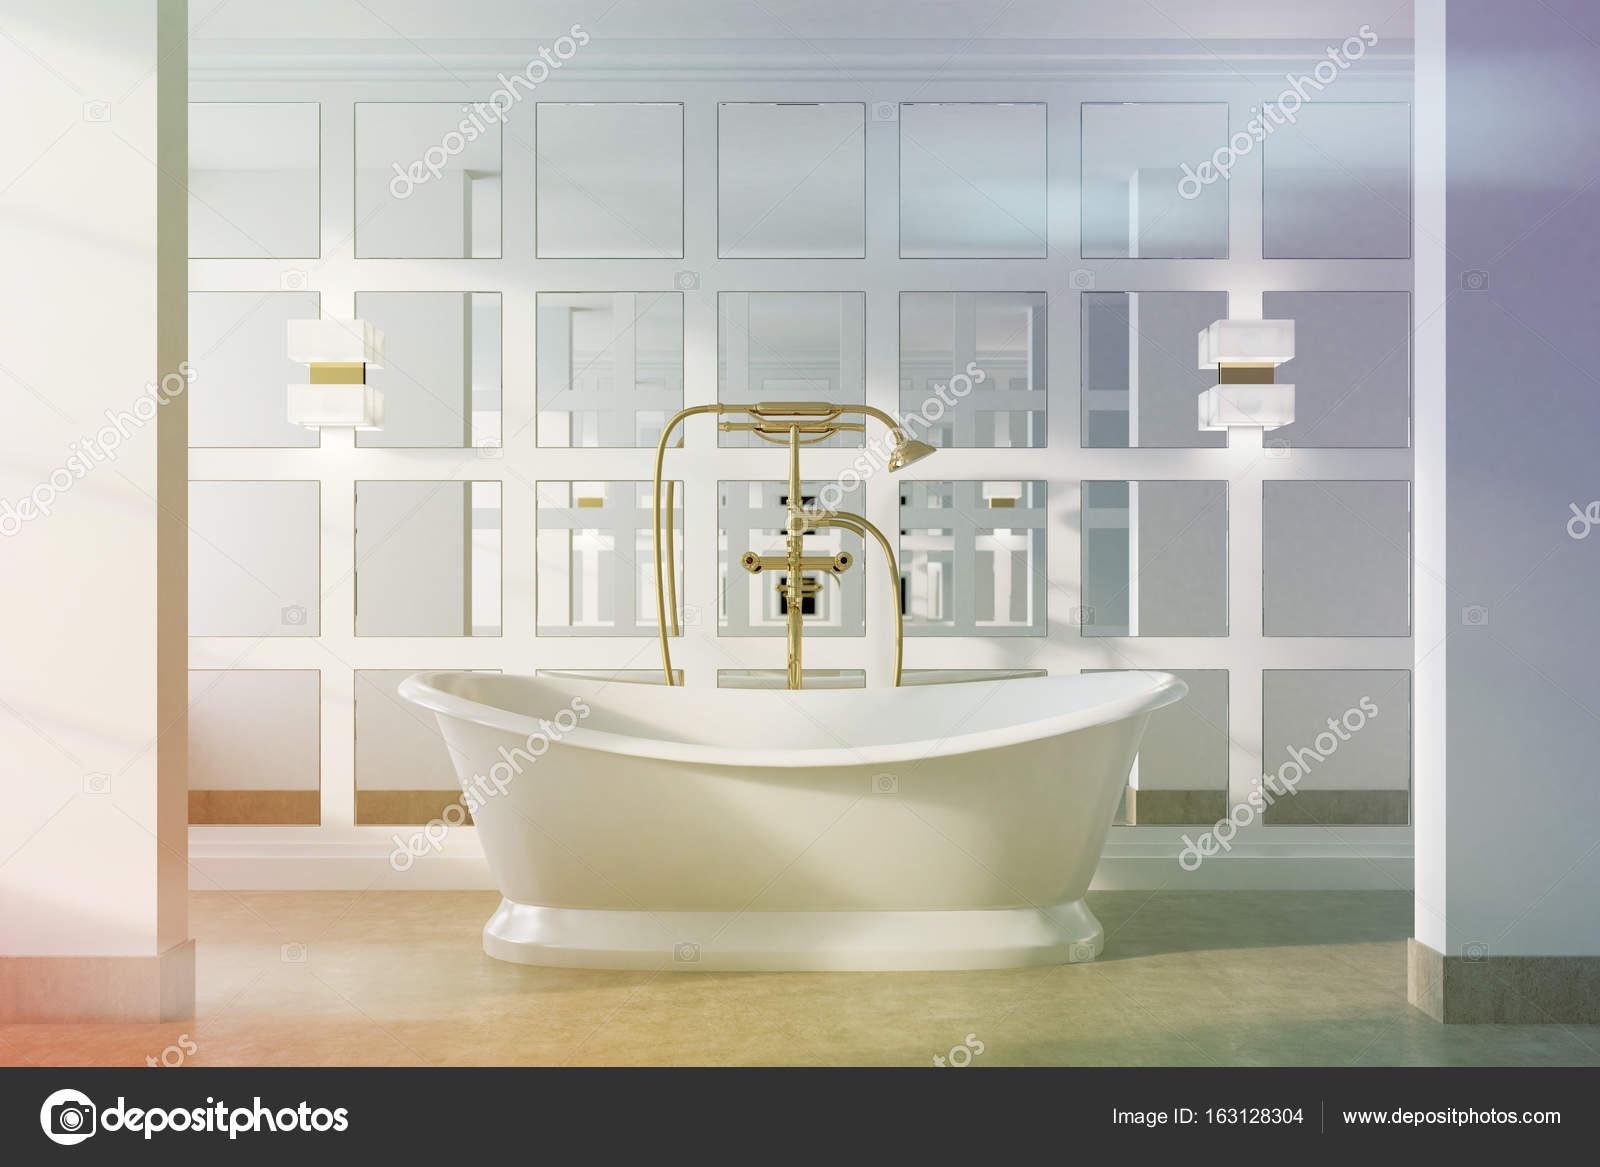 Vintage Bad, weiße Wanne, getönt — Stockfoto © denisismagilov #163128304